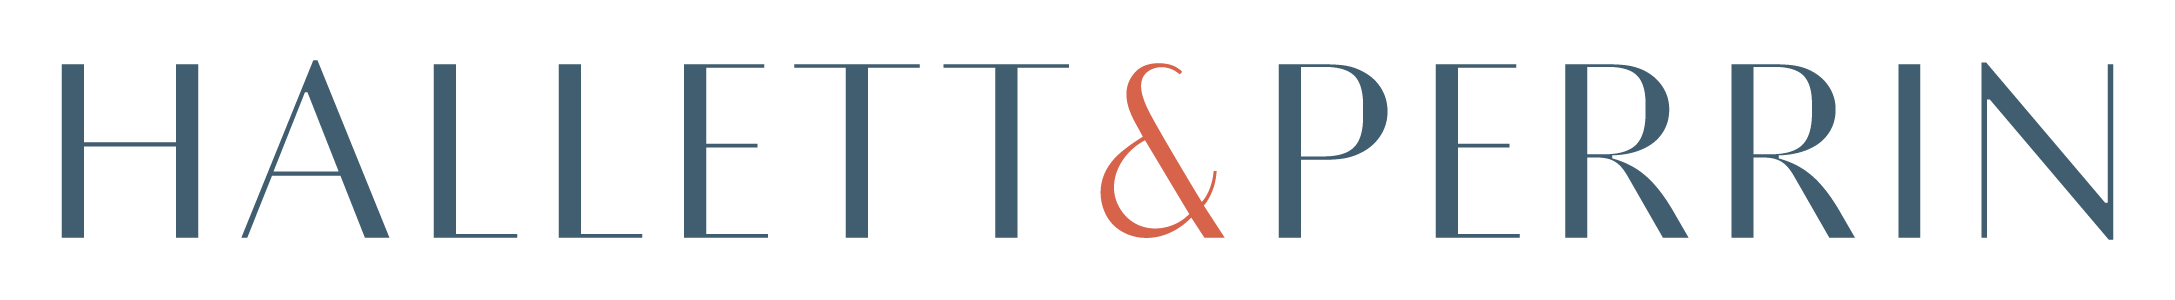 Corporate Sponsor logo